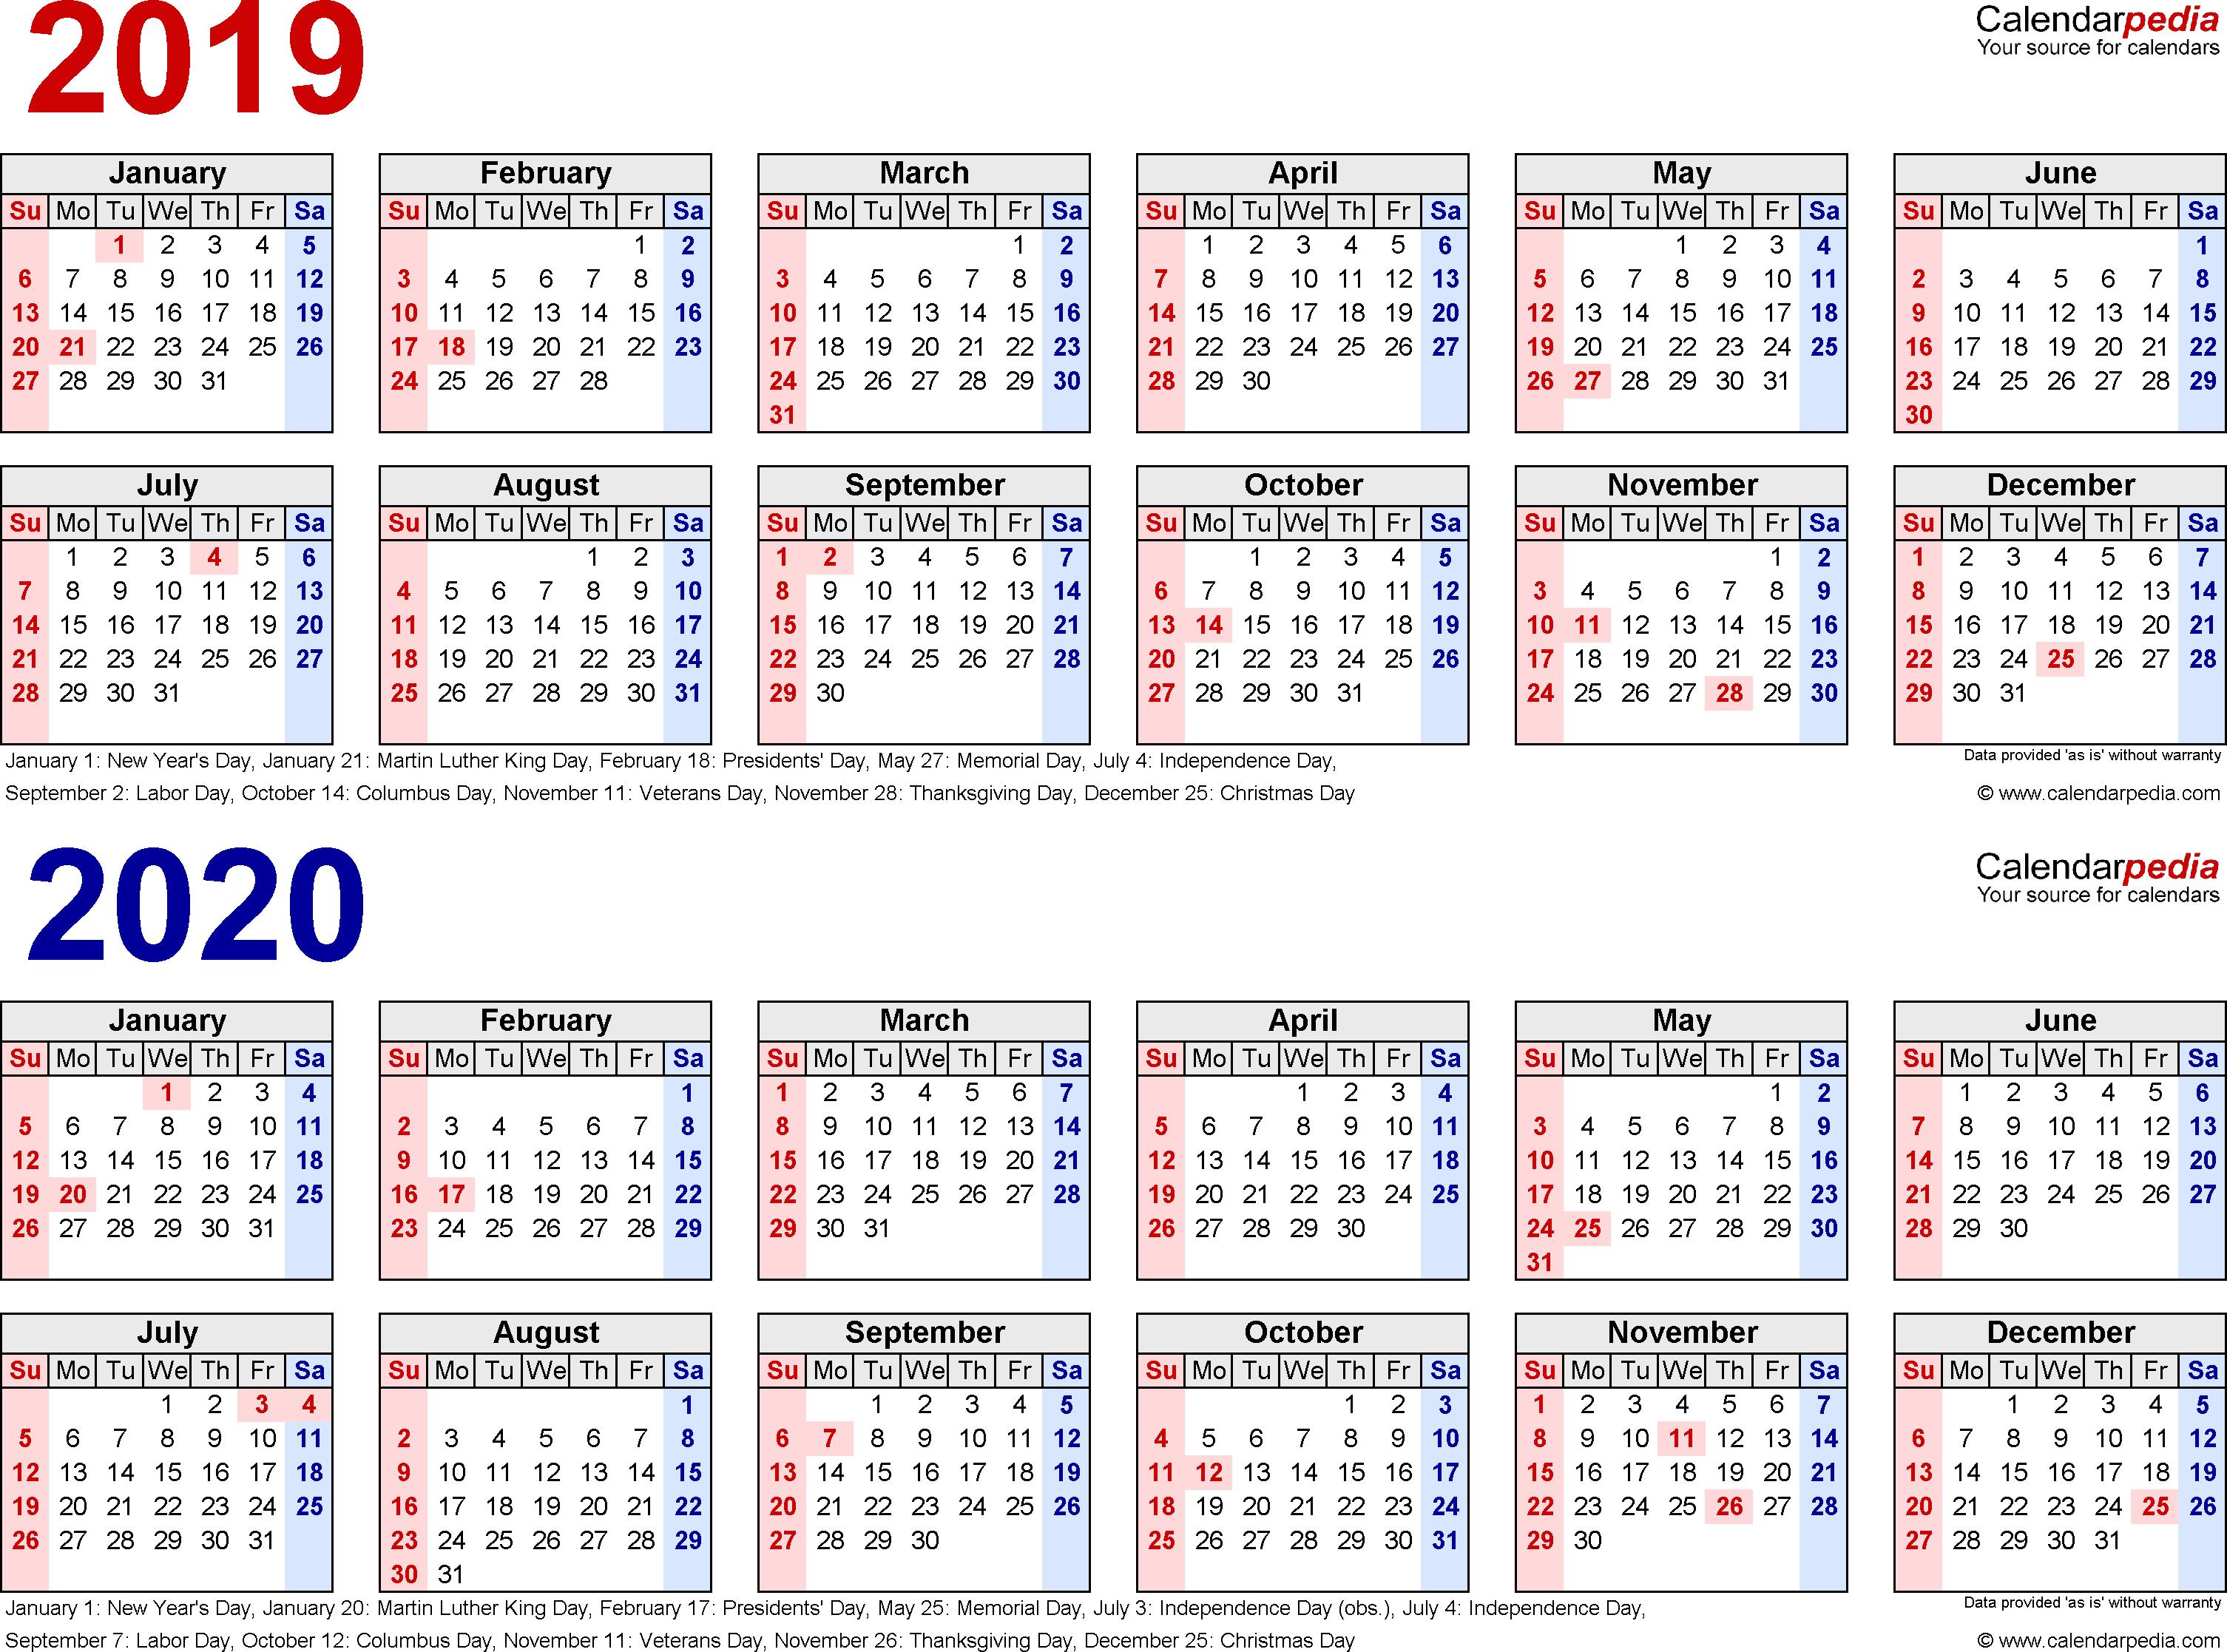 2019-2020 Calendar - Free Printable Two-Year Word Calendars